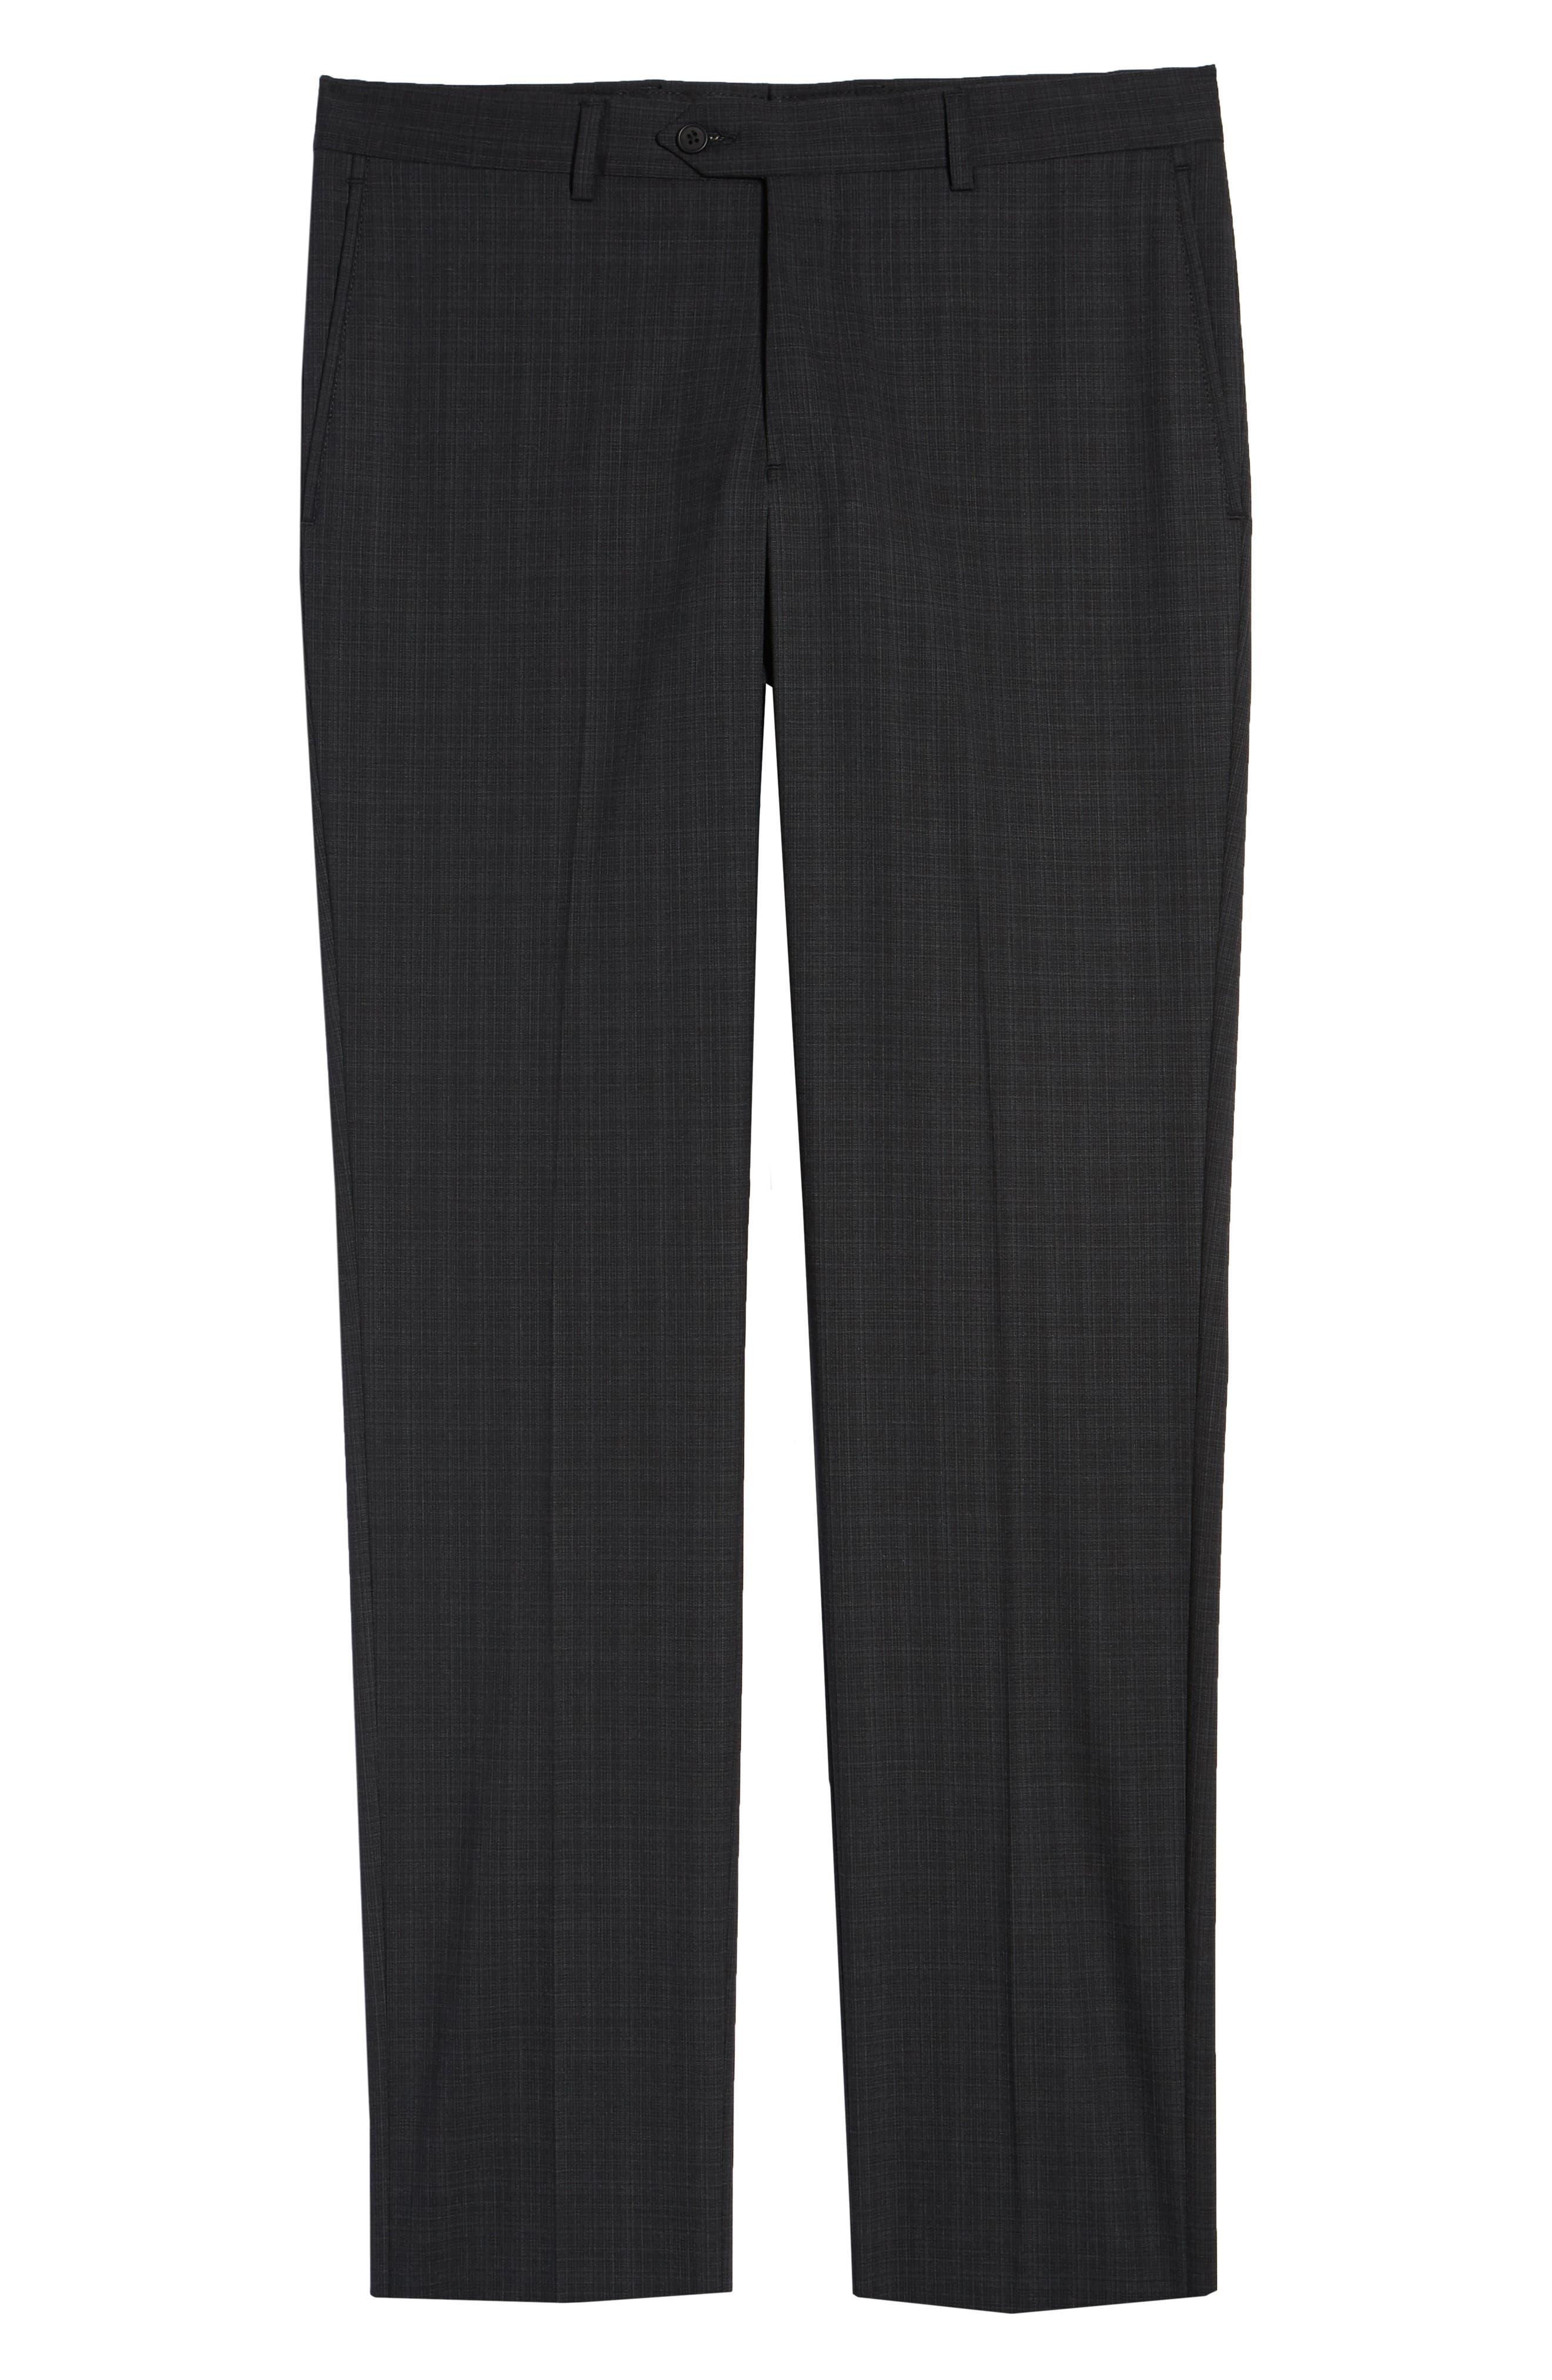 Trim Fit Flat Front Stretch Wool Pants,                             Alternate thumbnail 6, color,                             BLACK